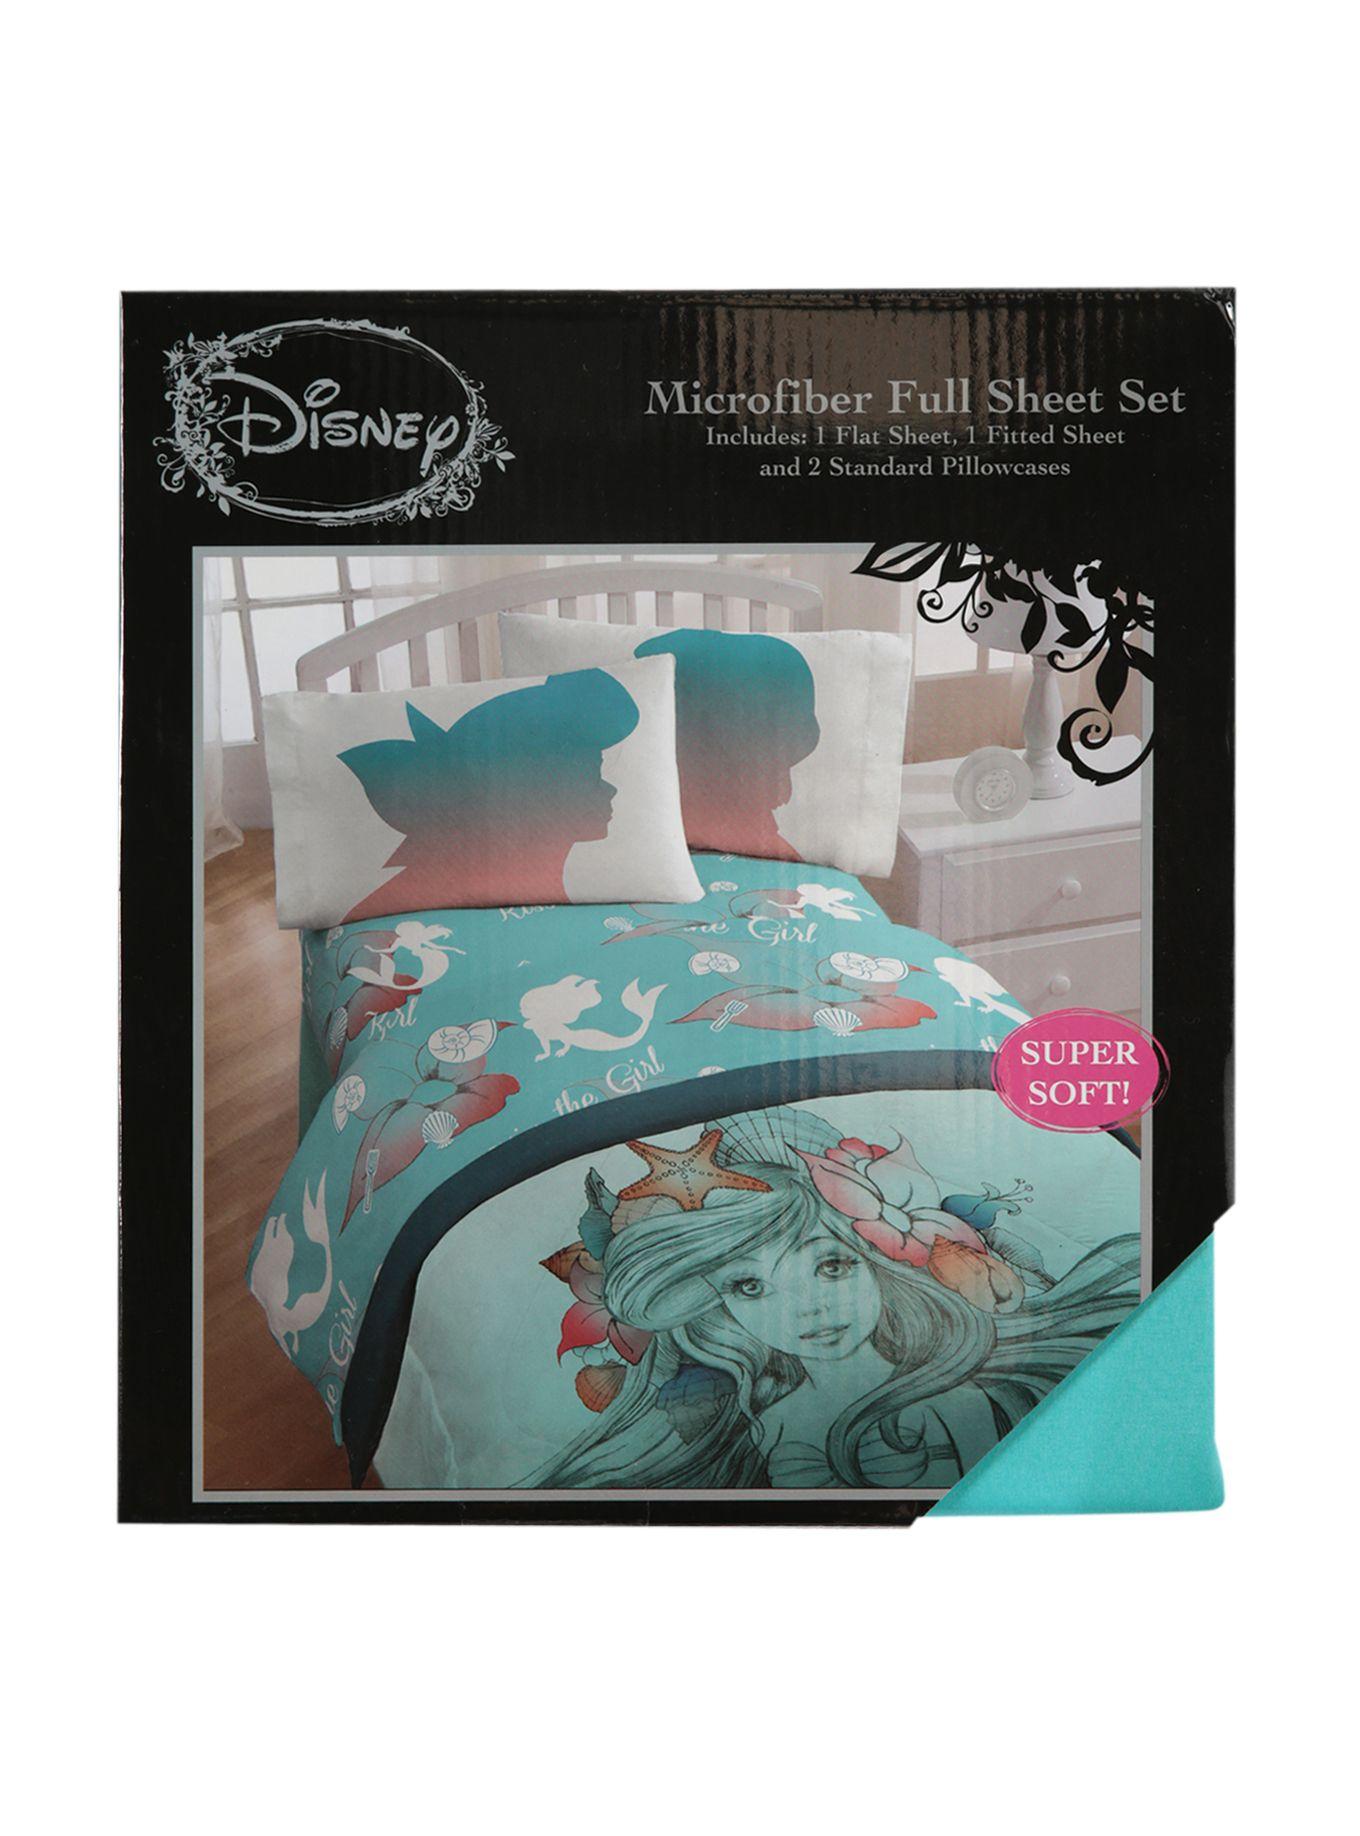 Disney The Little Mermaid Microfiber Full Sheet Set Hot